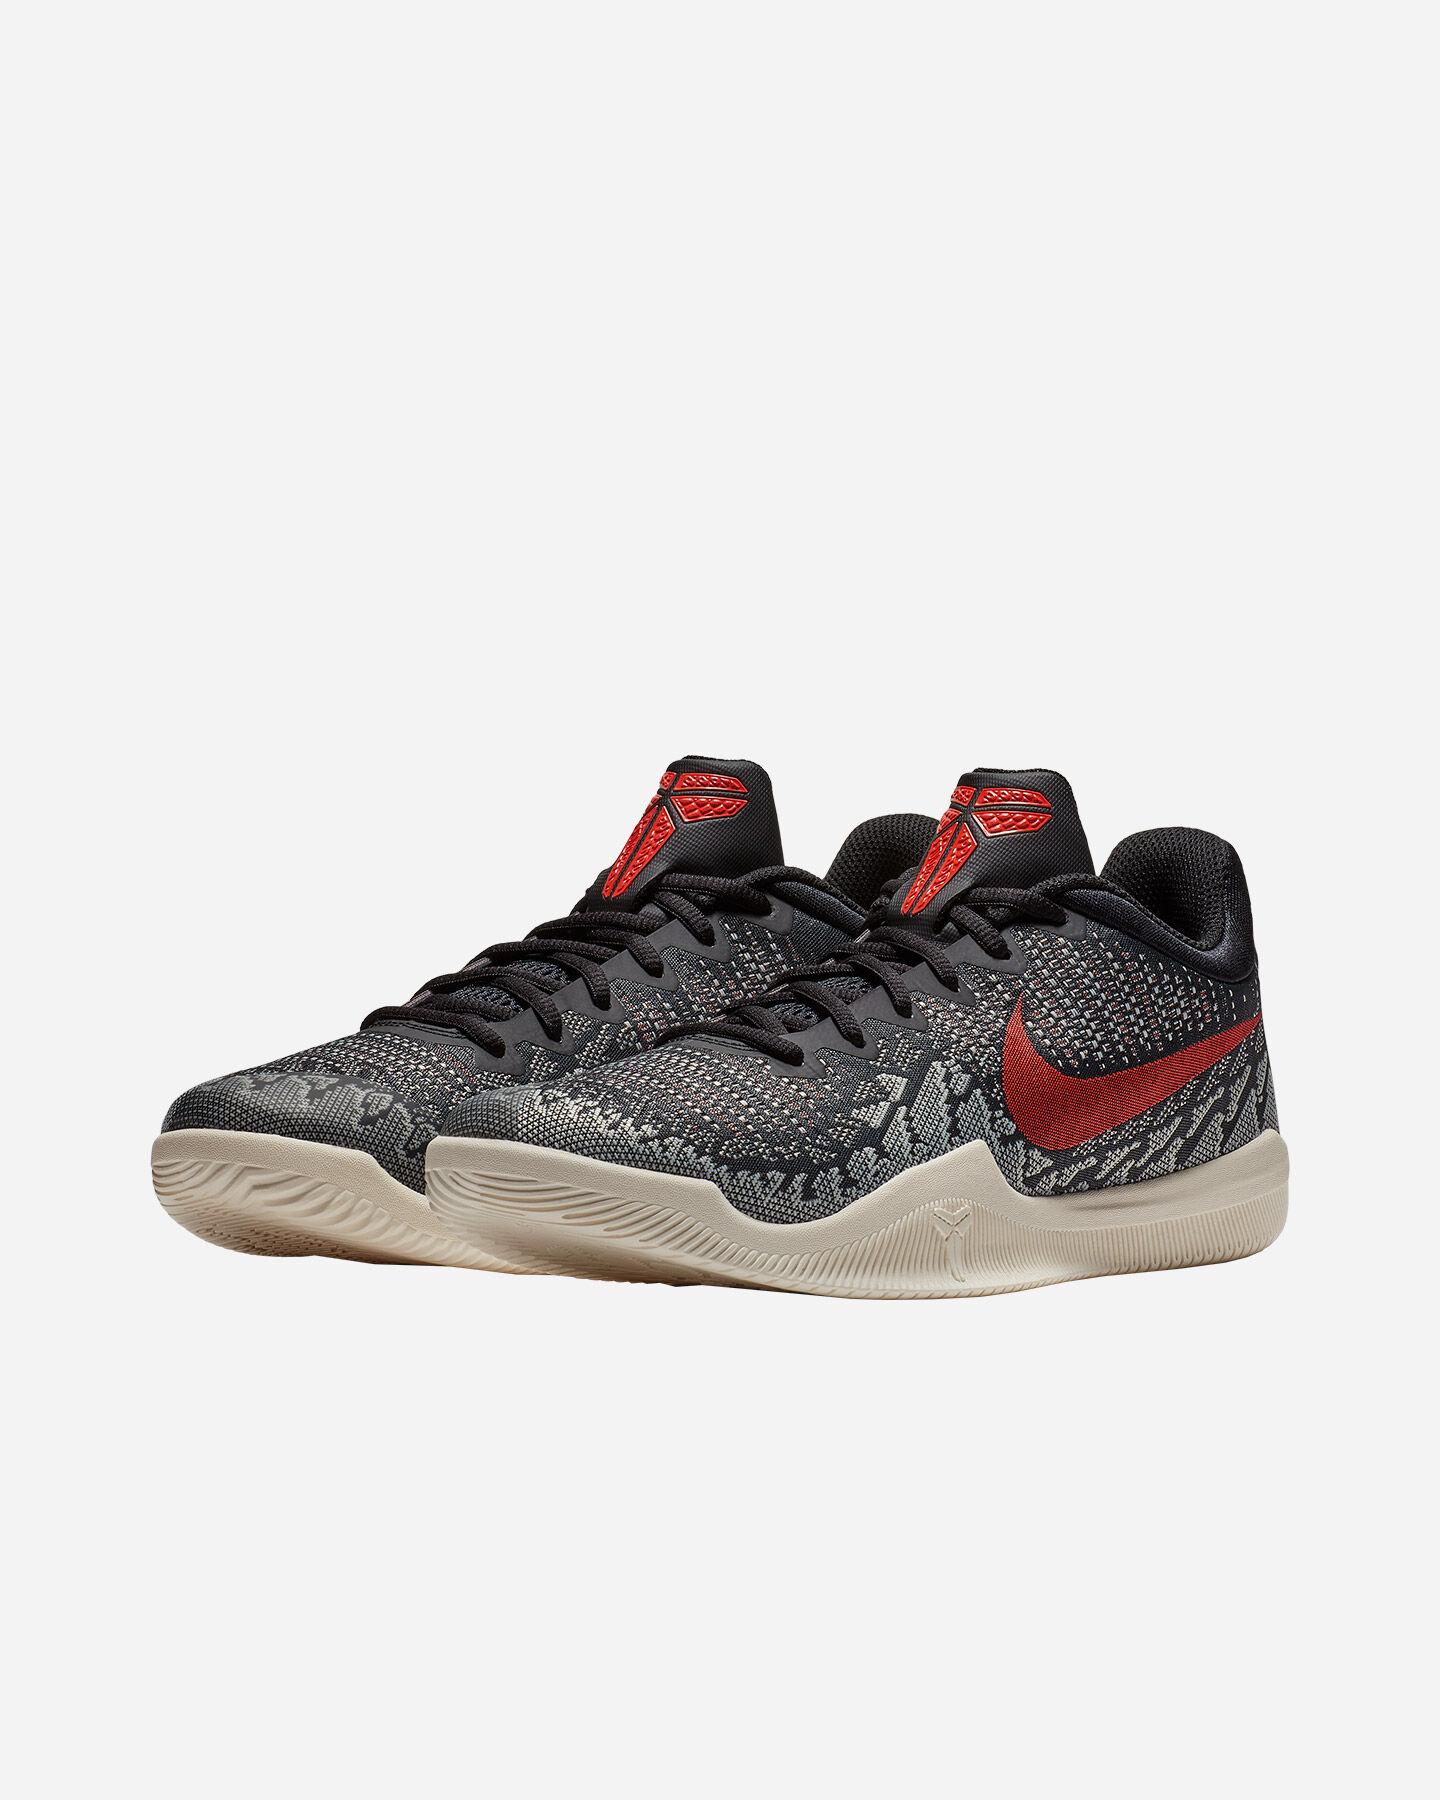 Scarpe Basket Mamba Rage Kobe Bryant